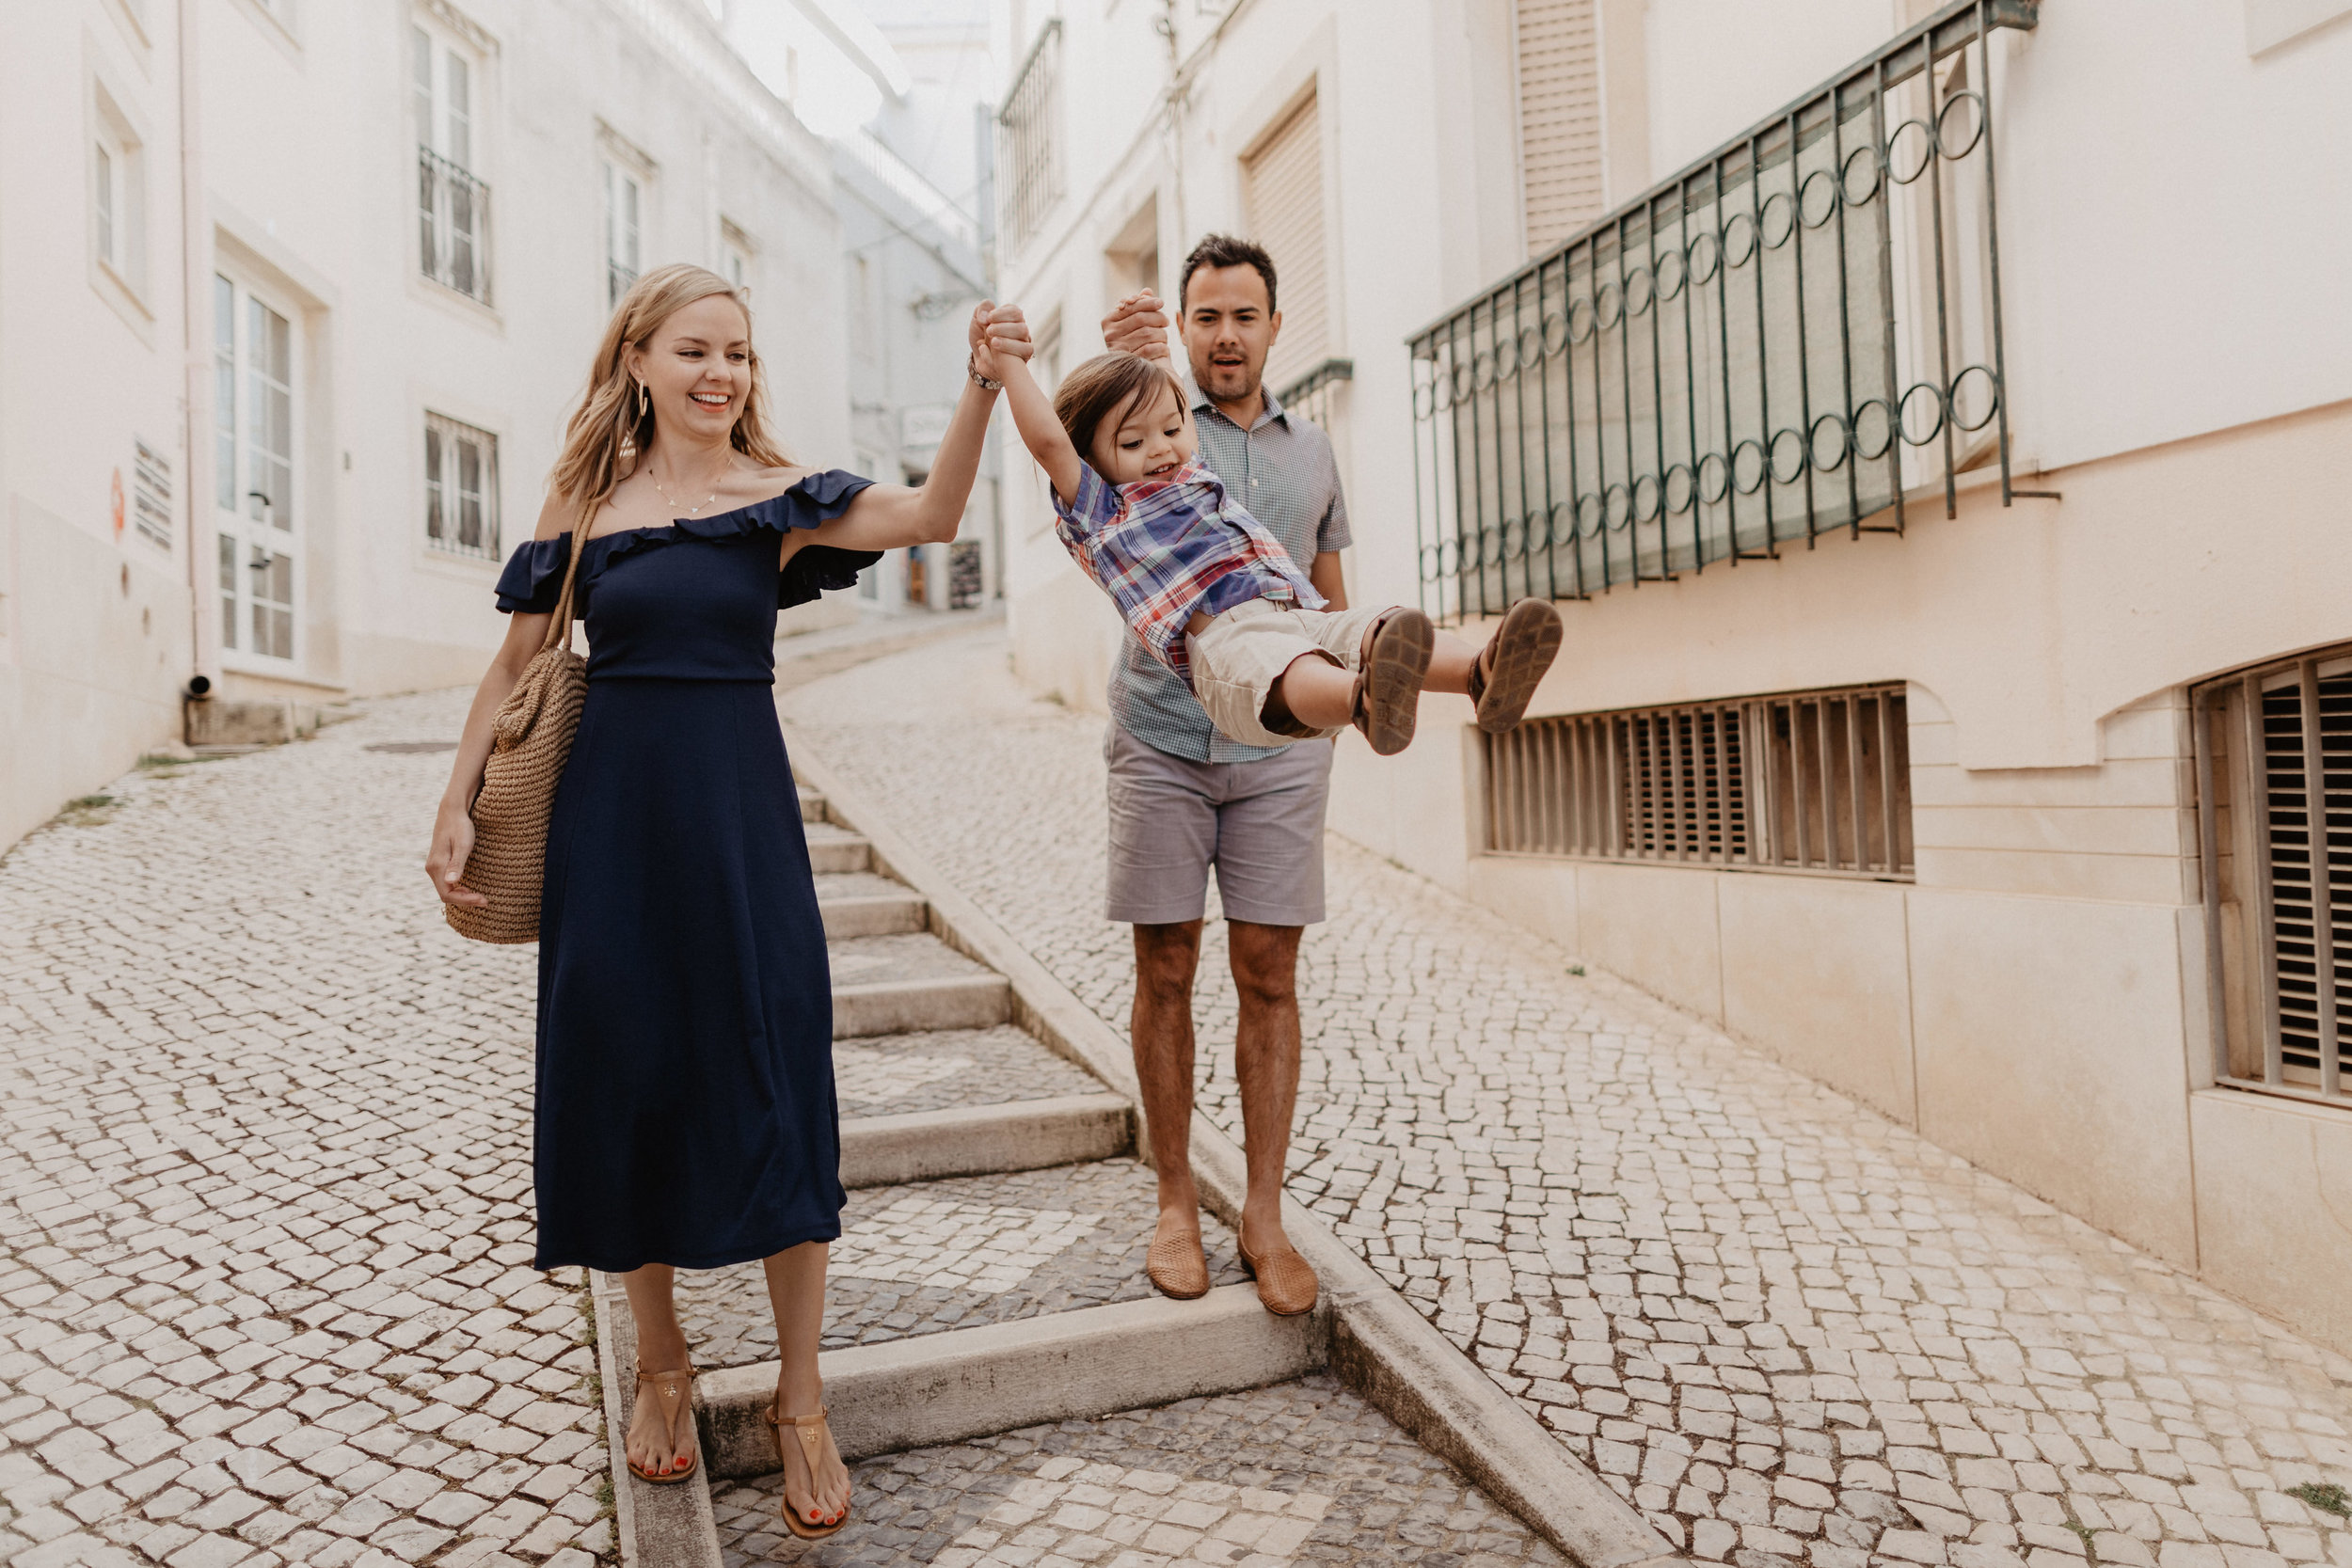 Lapela-Family-photography-Lagos-Algarve11.jpg